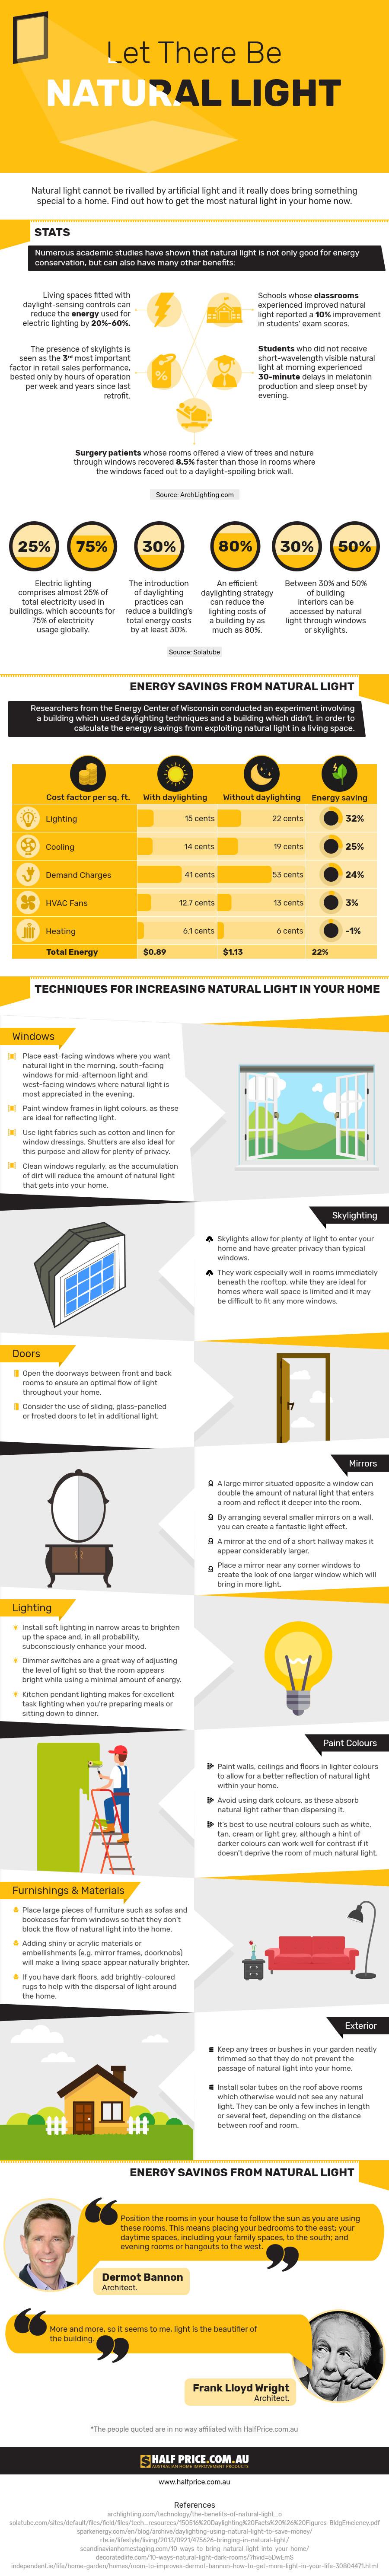 Natural Light Benefits [Infographic]   ecogreenlove